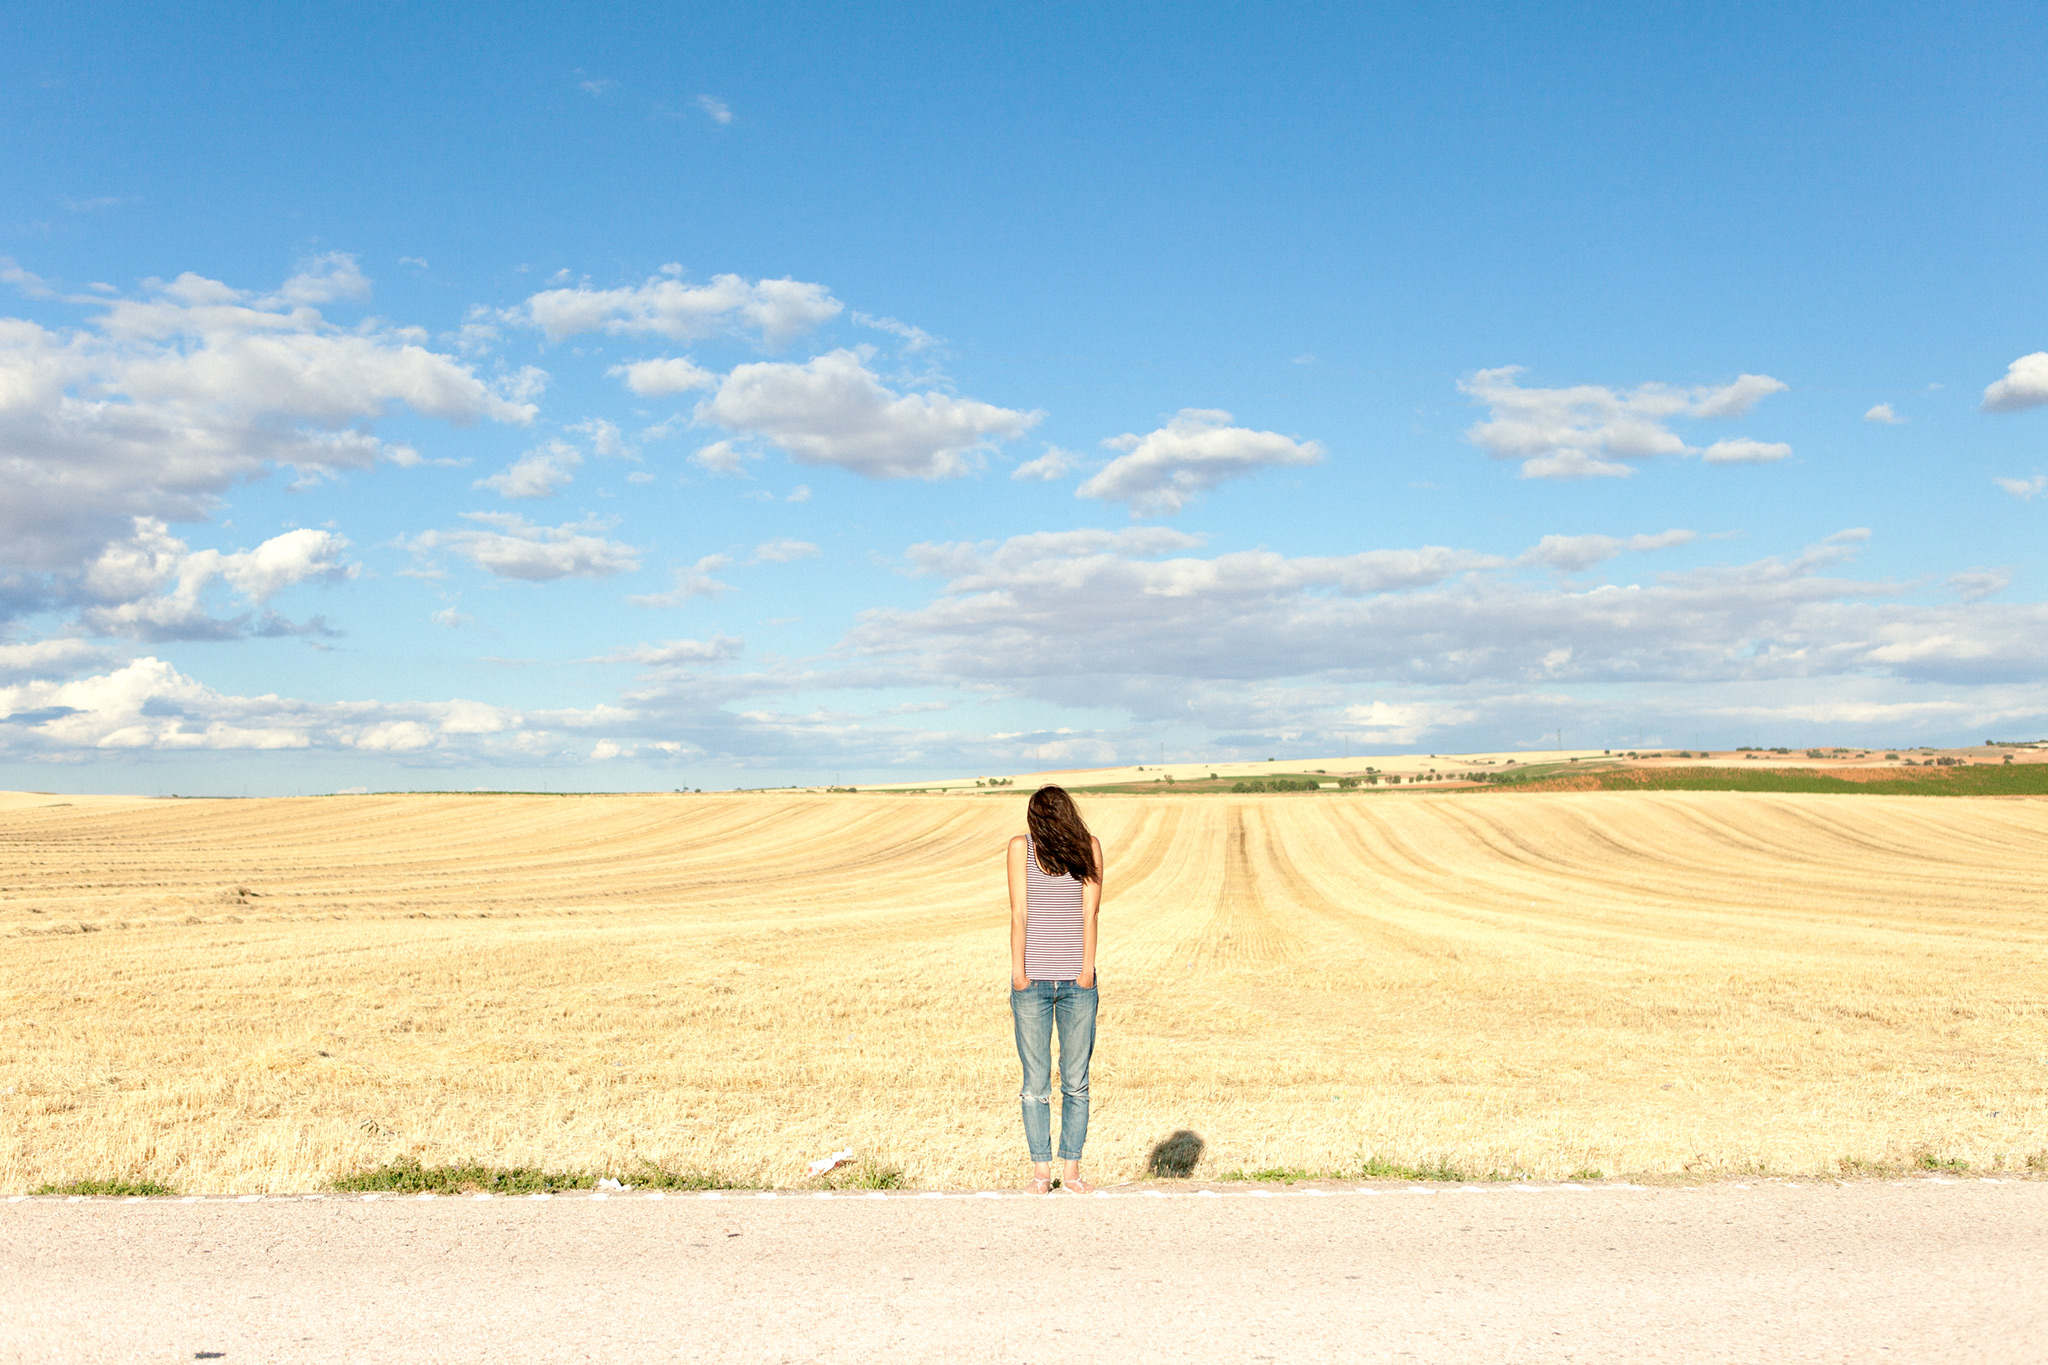 Ana, Lost in La Mancha